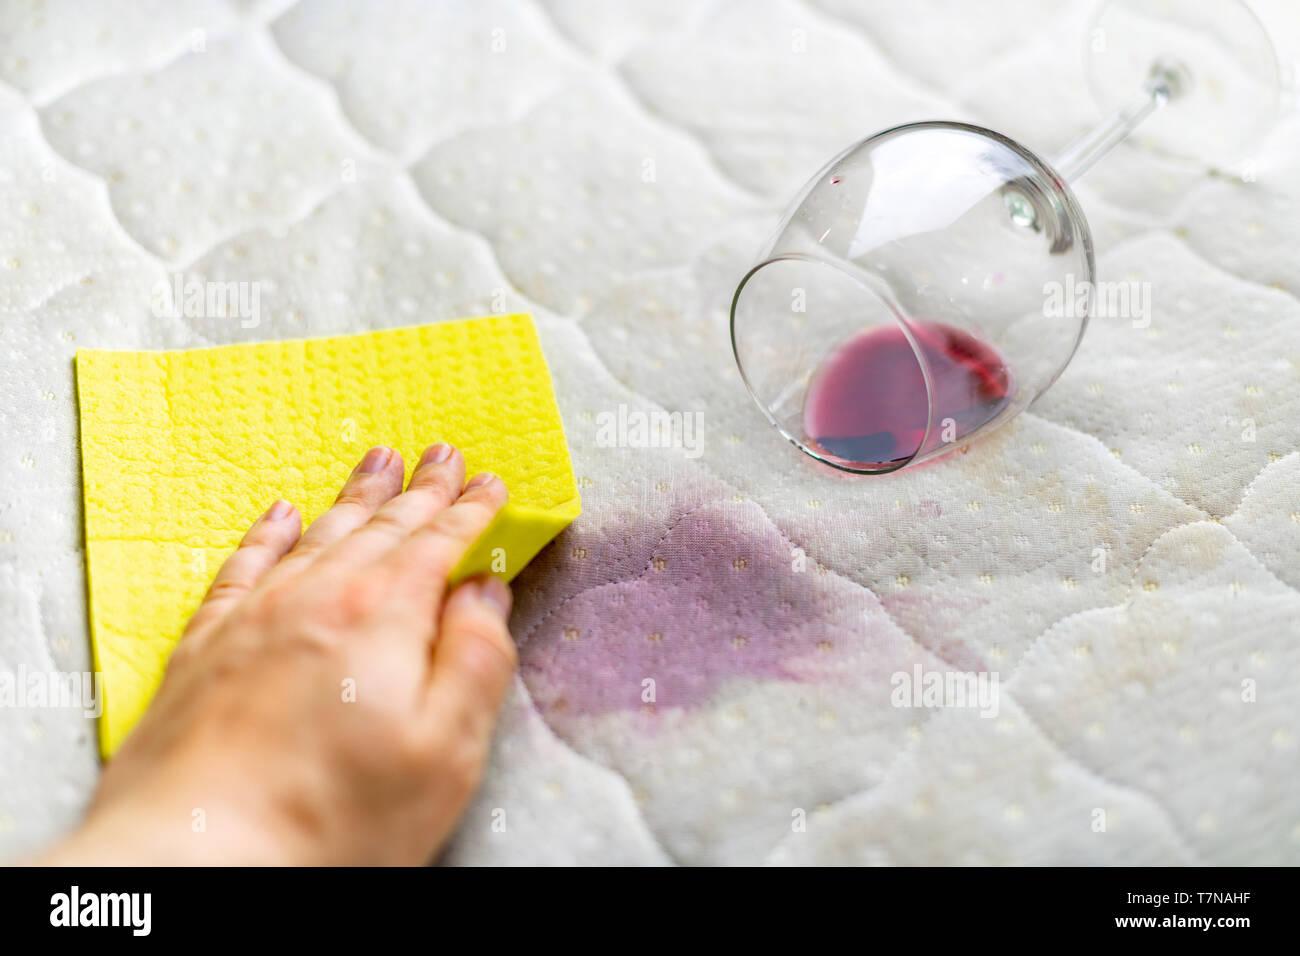 Miraculous Sponge Cleaning Wine Stain Dropped Wineglass Spilled Wine Inzonedesignstudio Interior Chair Design Inzonedesignstudiocom